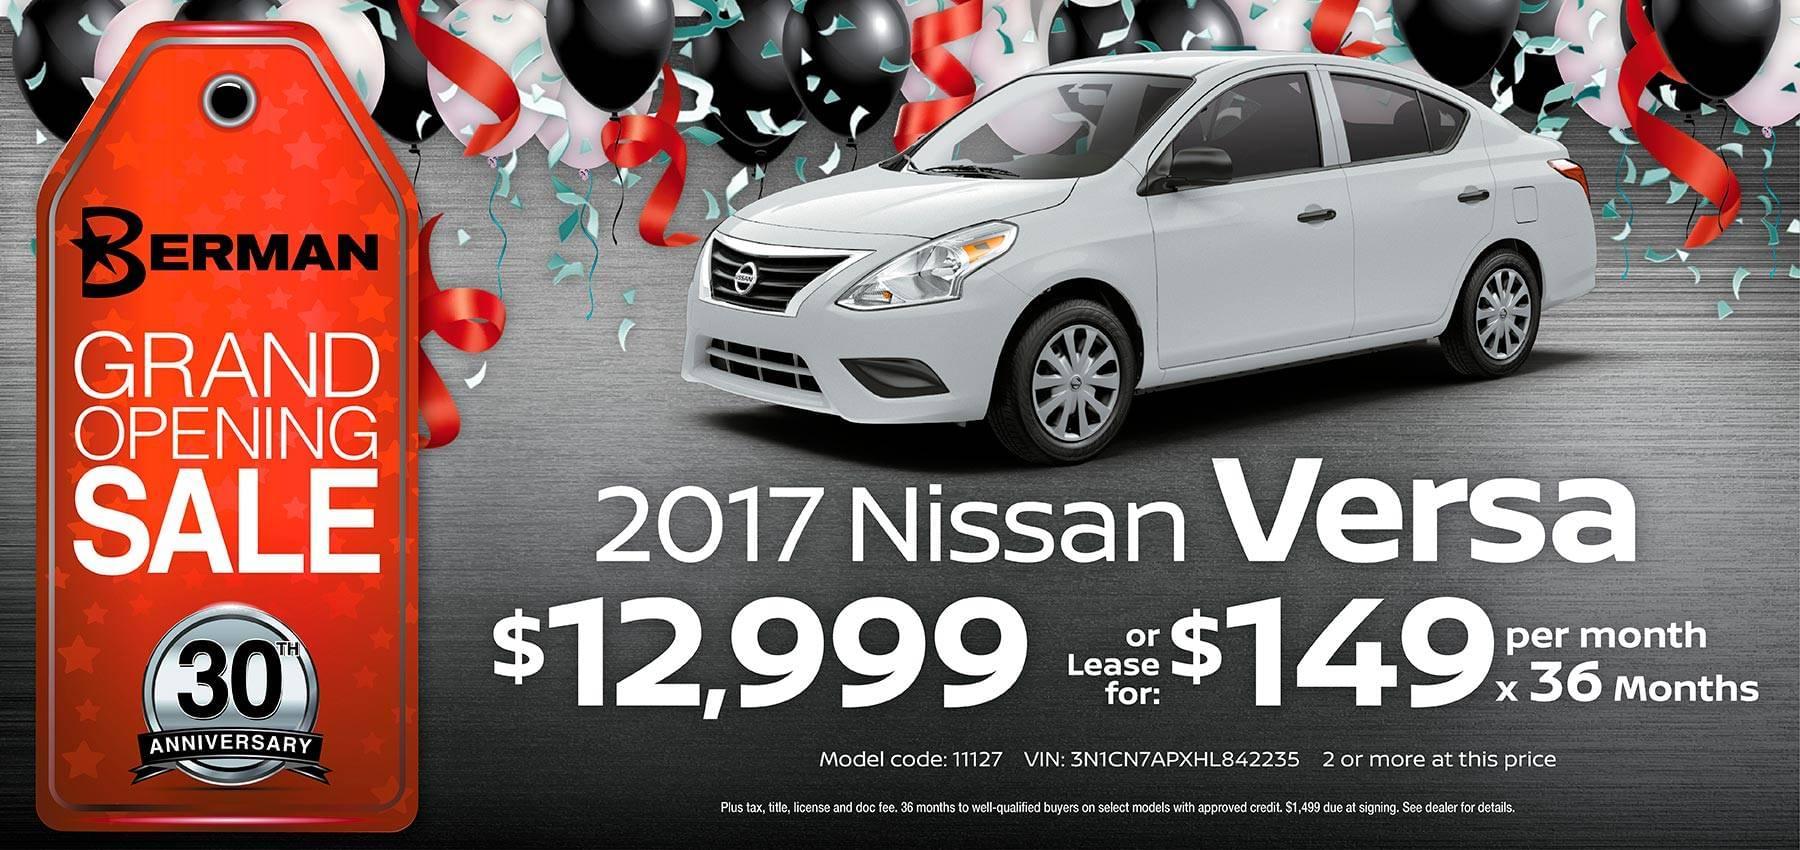 2017 Nissan Versa Berman Nissan of Chicago March Grand Opening Sale